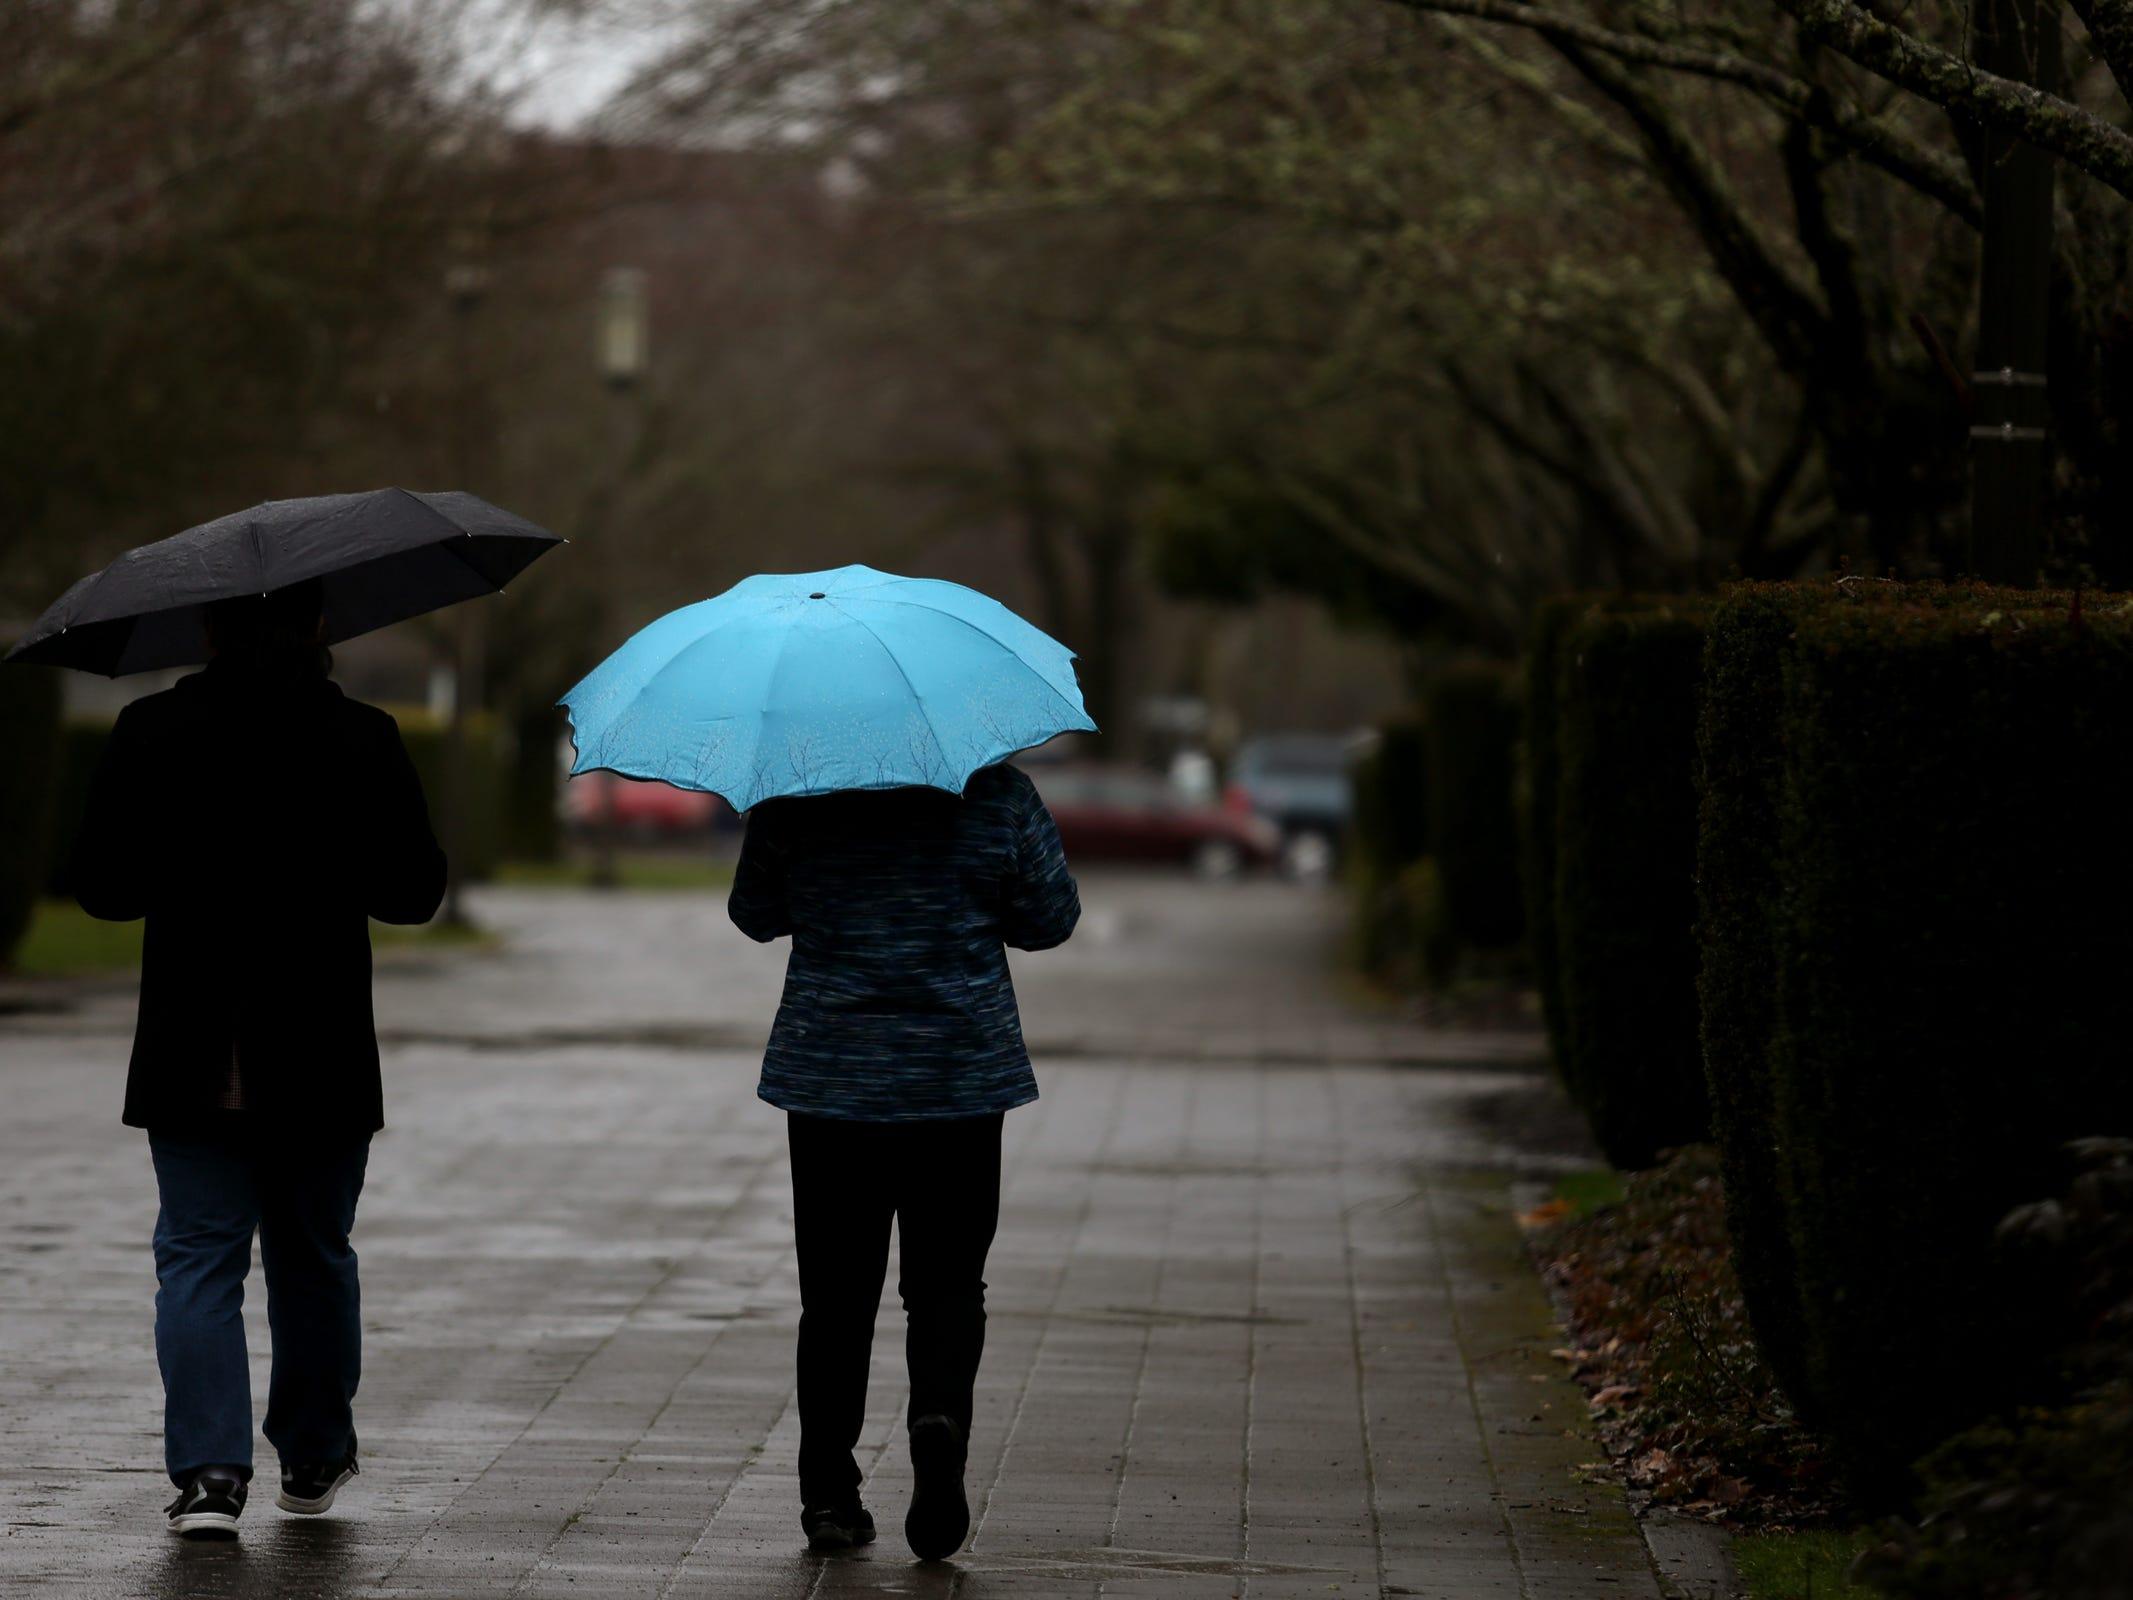 People walk with umbrellas as rain falls in Salem on Thursday, Feb. 14, 2019.